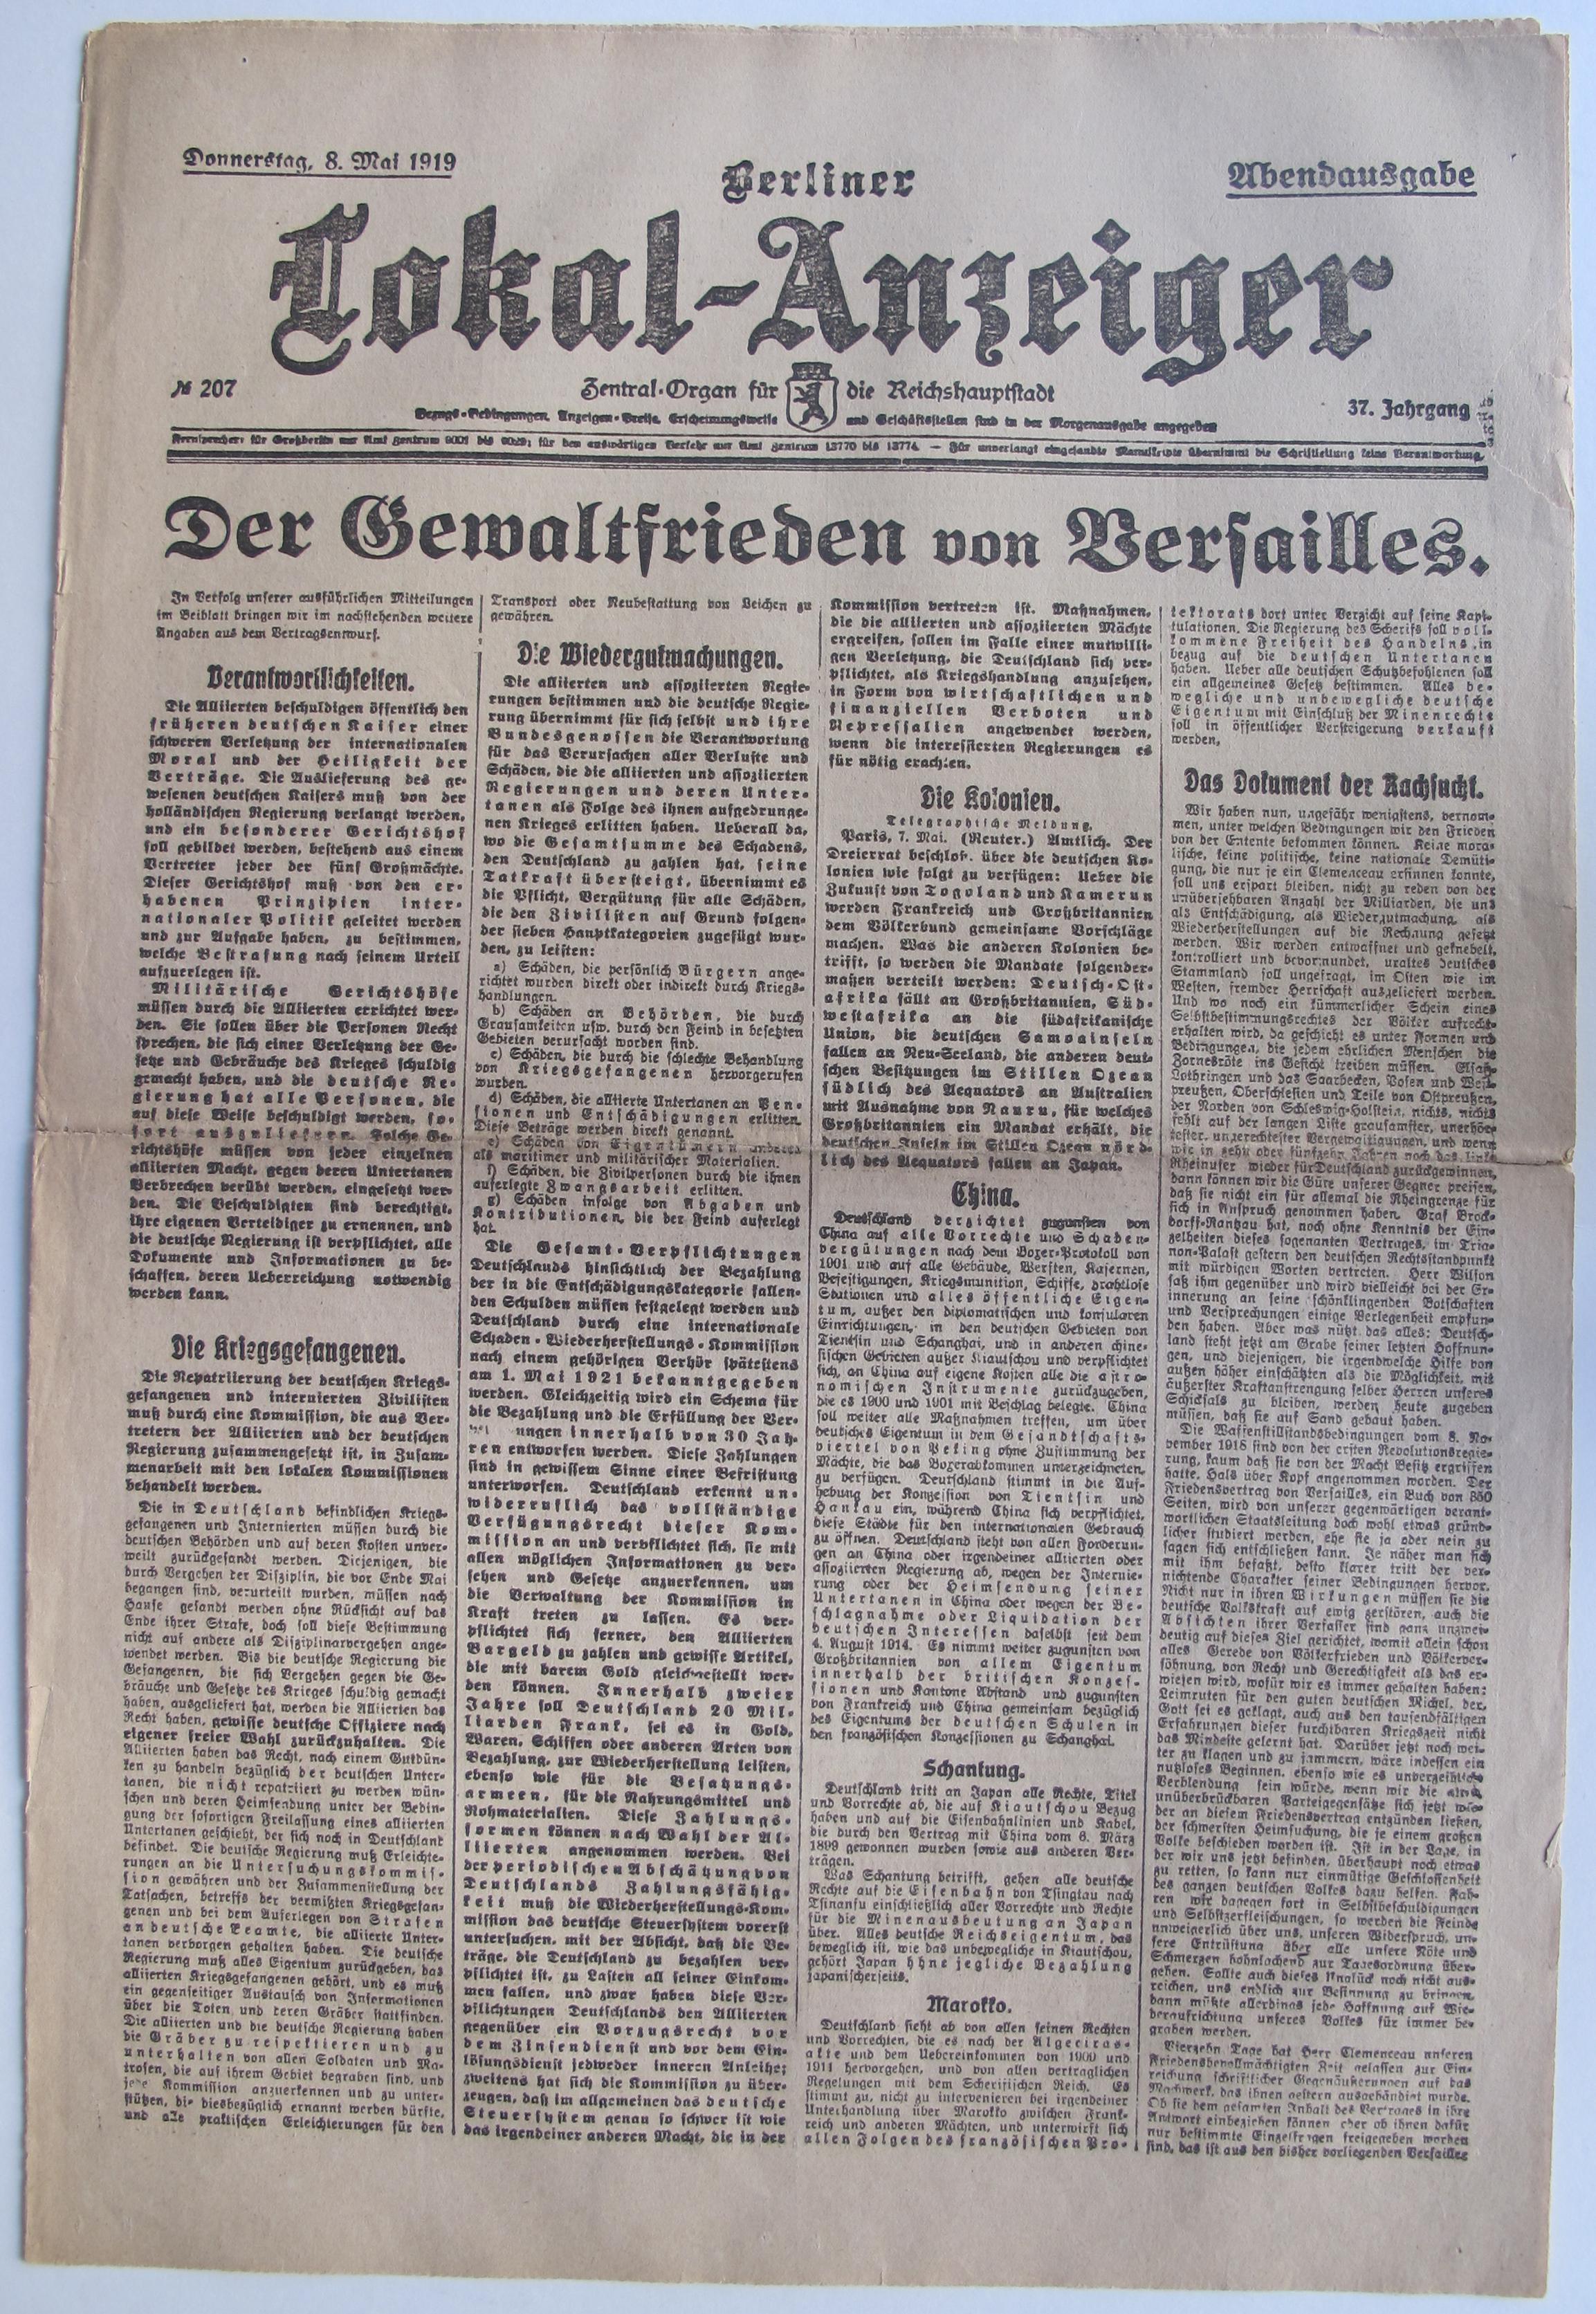 Lemo Jahreschronik Chronik 1919